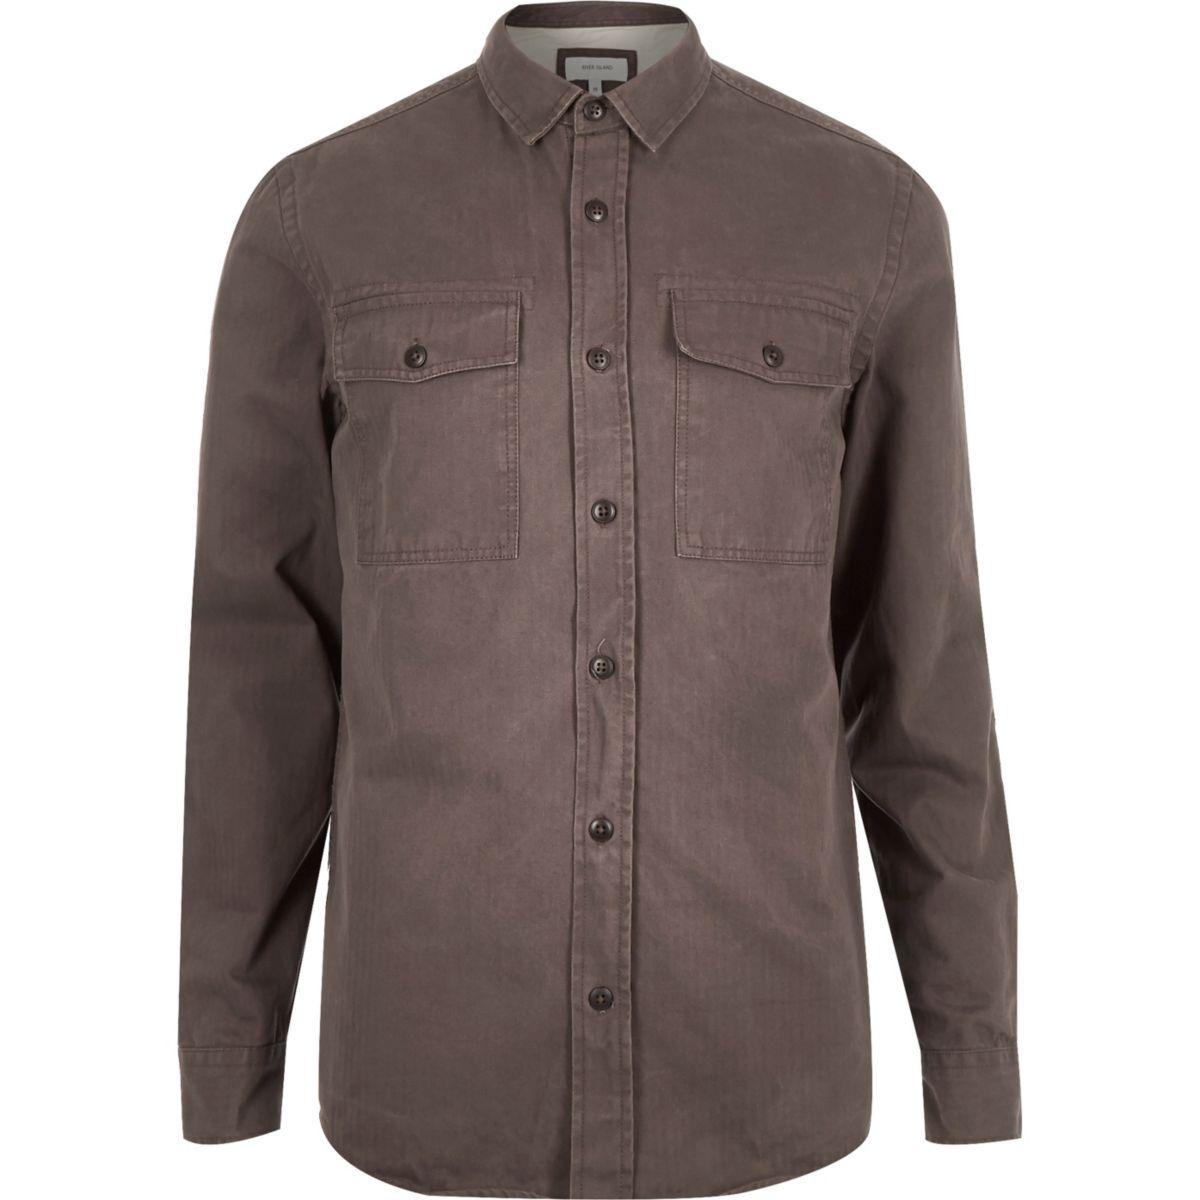 Brown herringbone utility overshirt